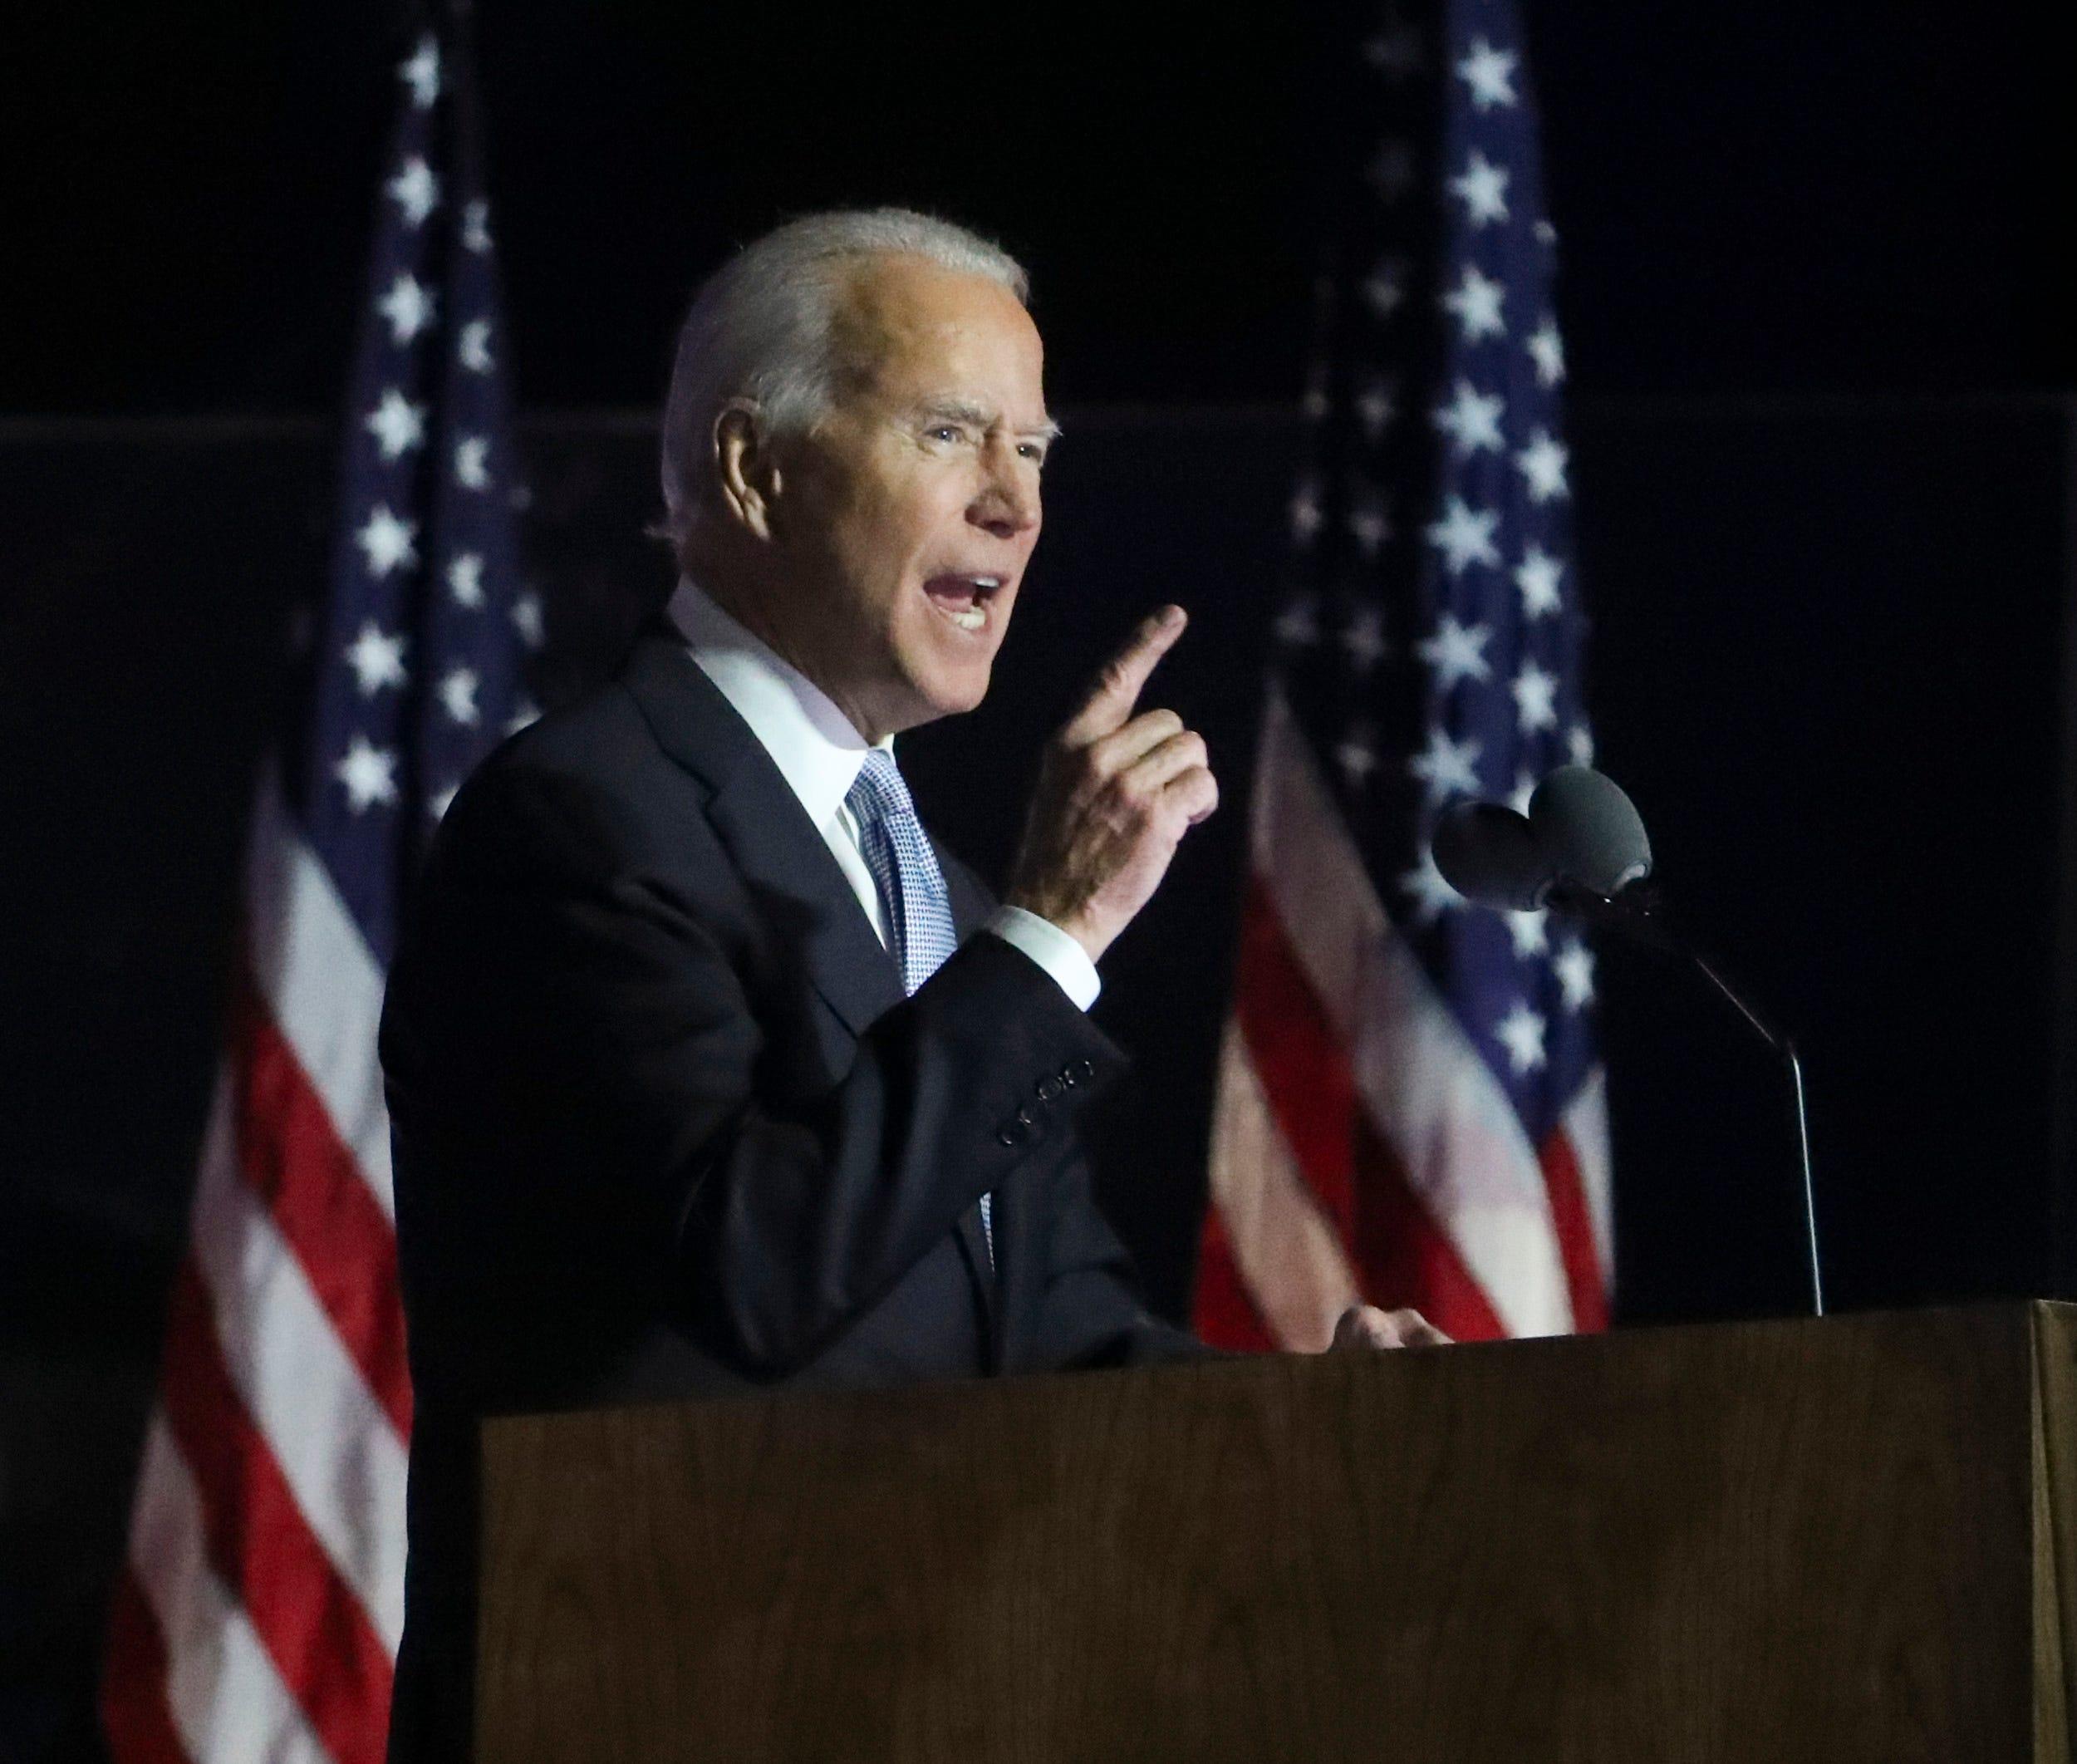 Biden s faith comes through in speech, quoting Catholic hymn and Bible verse